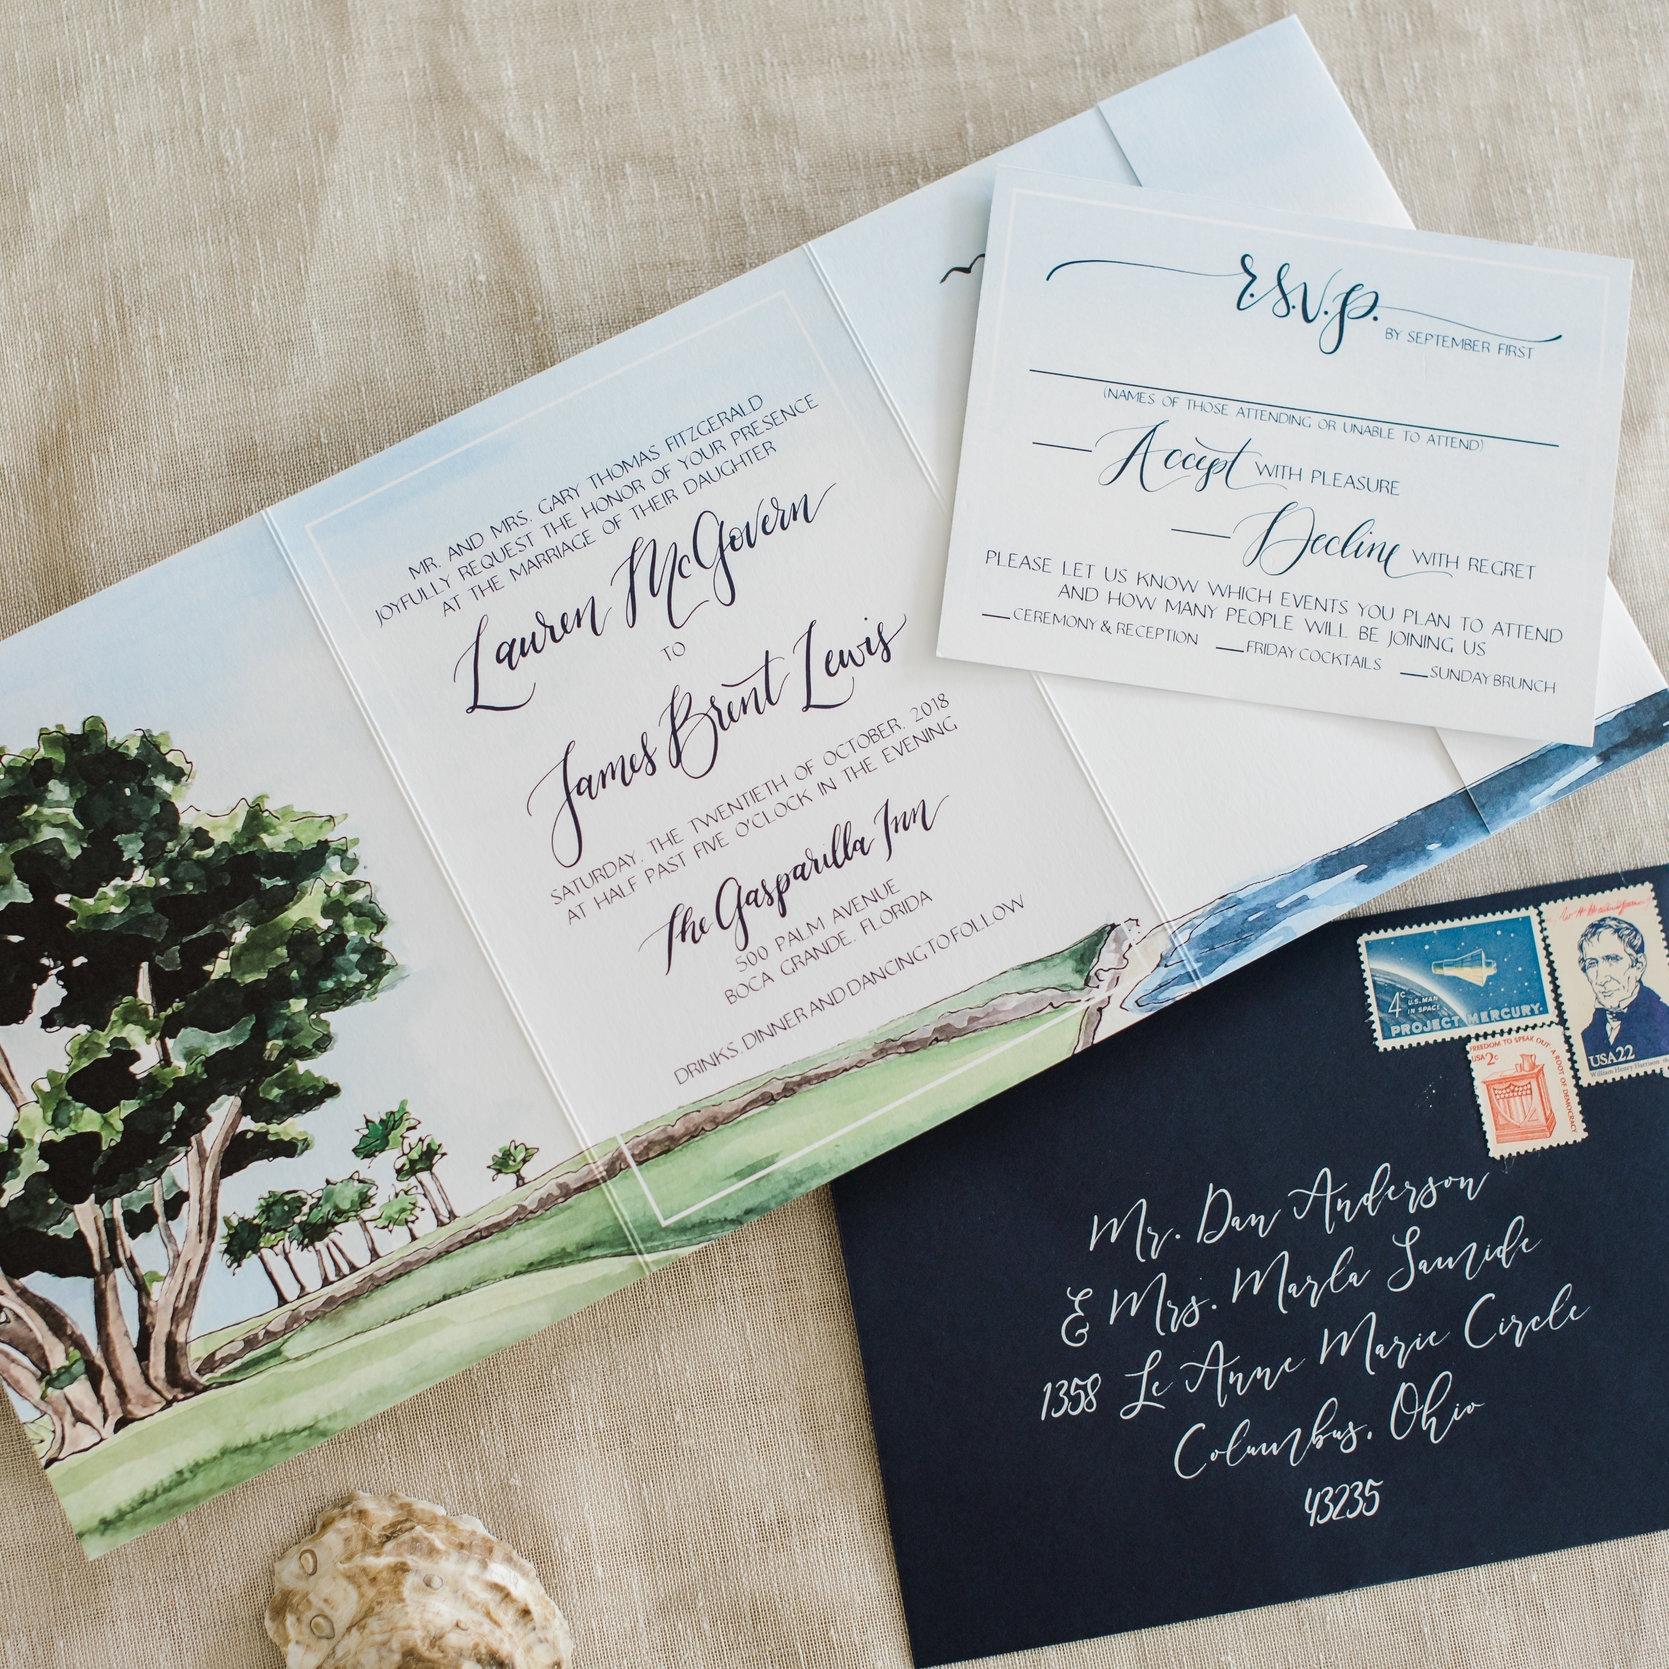 BOCA GRANDE GASPARILLA ISLAND WEDDING INVITATIONS